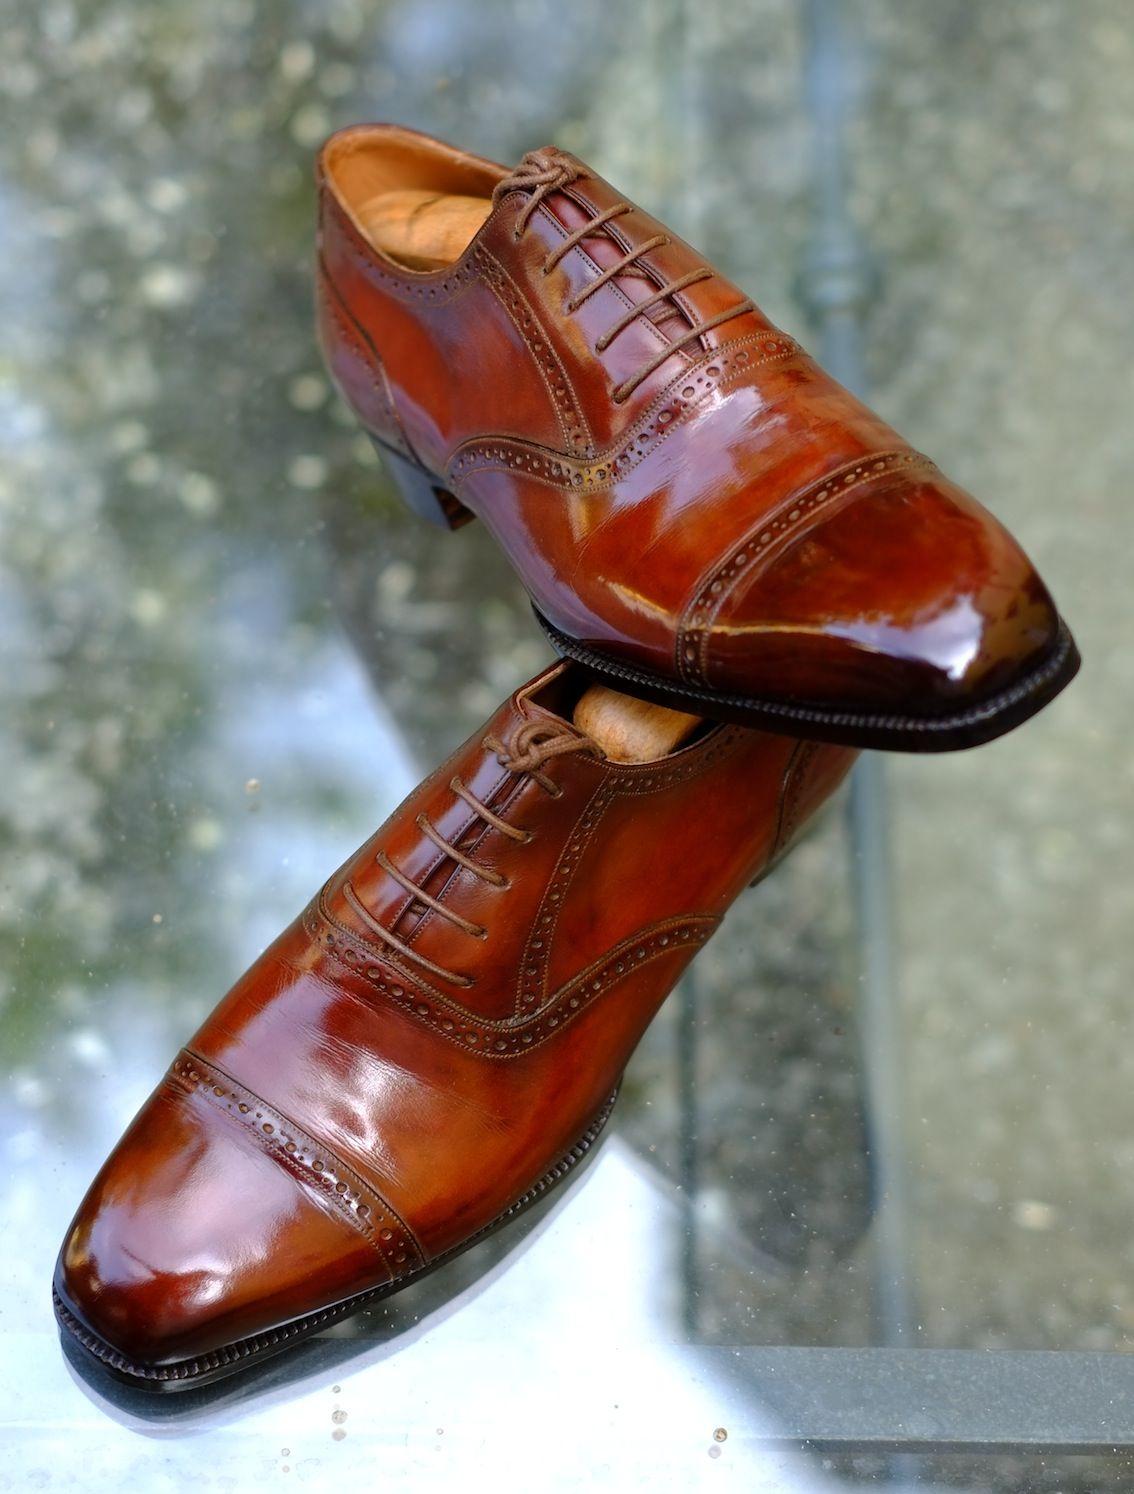 The Shoe AristoCat